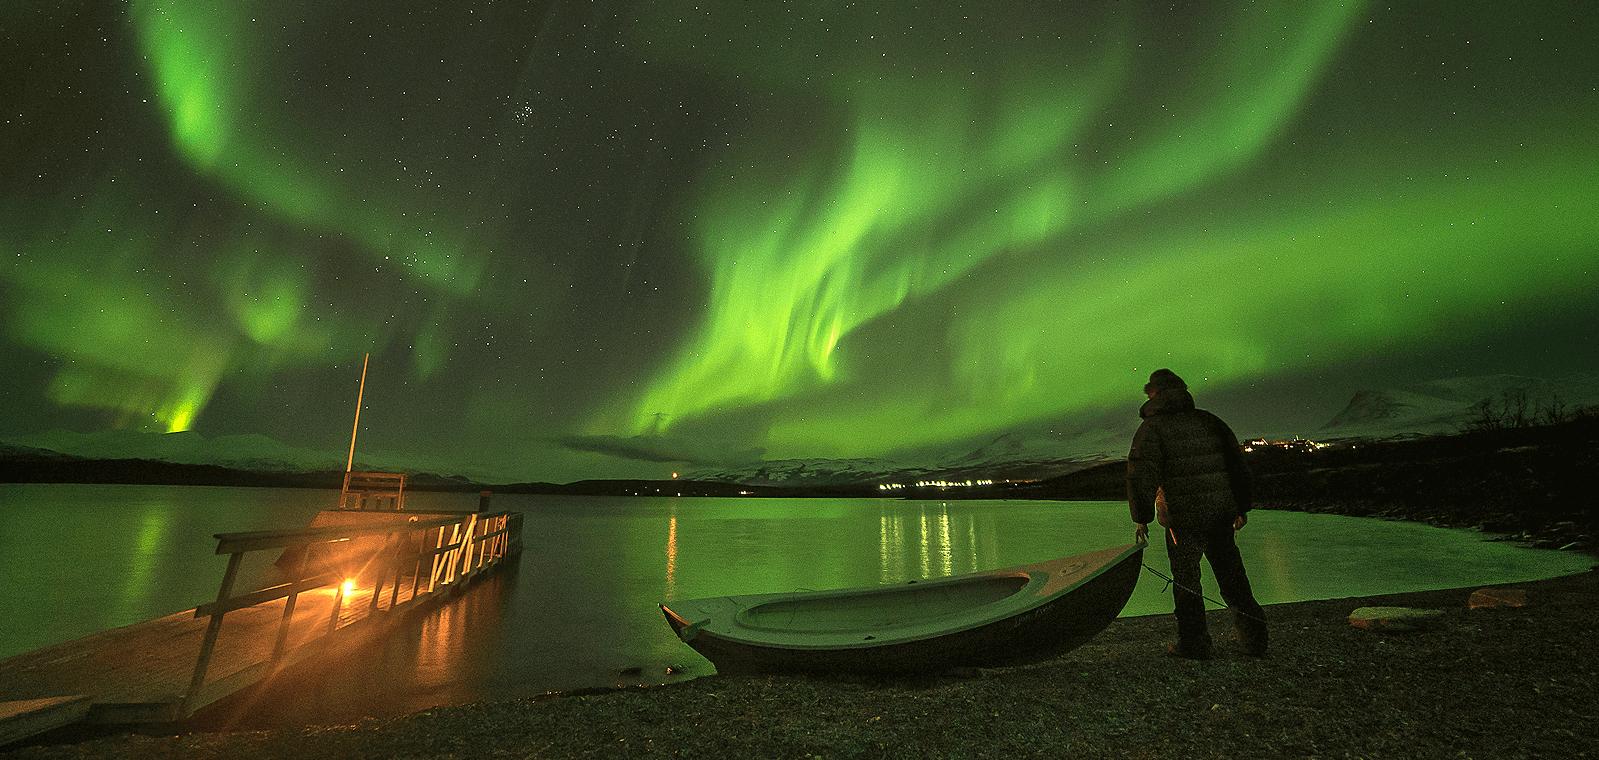 Such a majestic view of the Aurora Borealis in Abisko, Sweden.